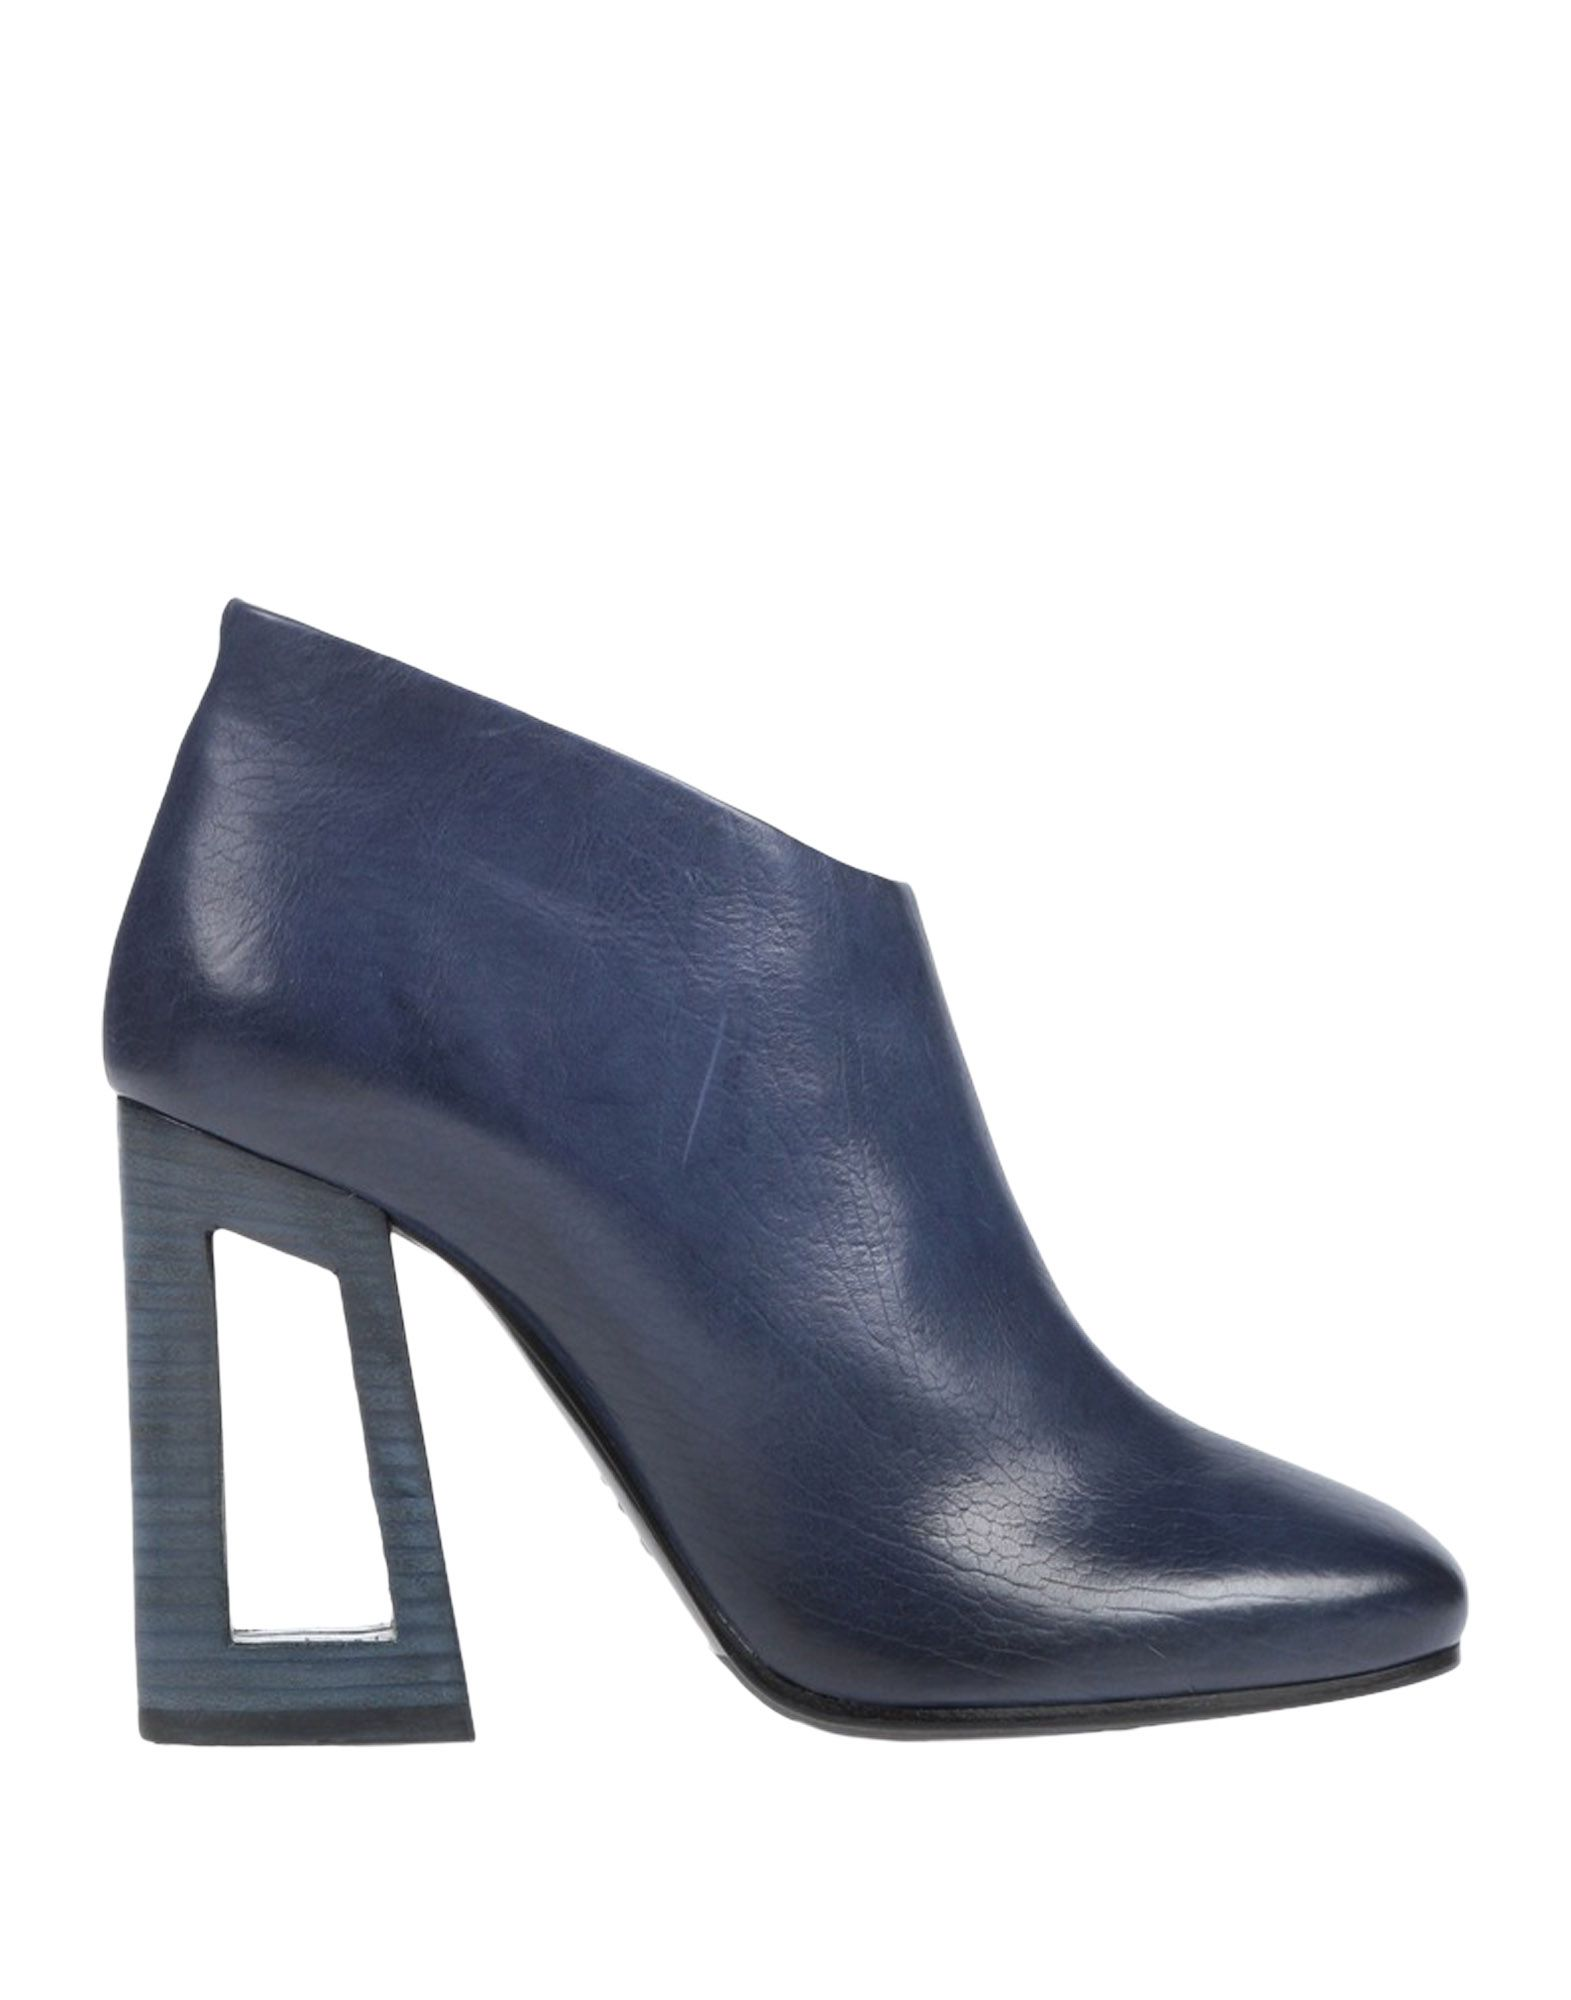 Vic Women Matiē Ankle Boot - Women Vic Vic Matiē Ankle Boots online on  Canada - 11253709LH 054b7e